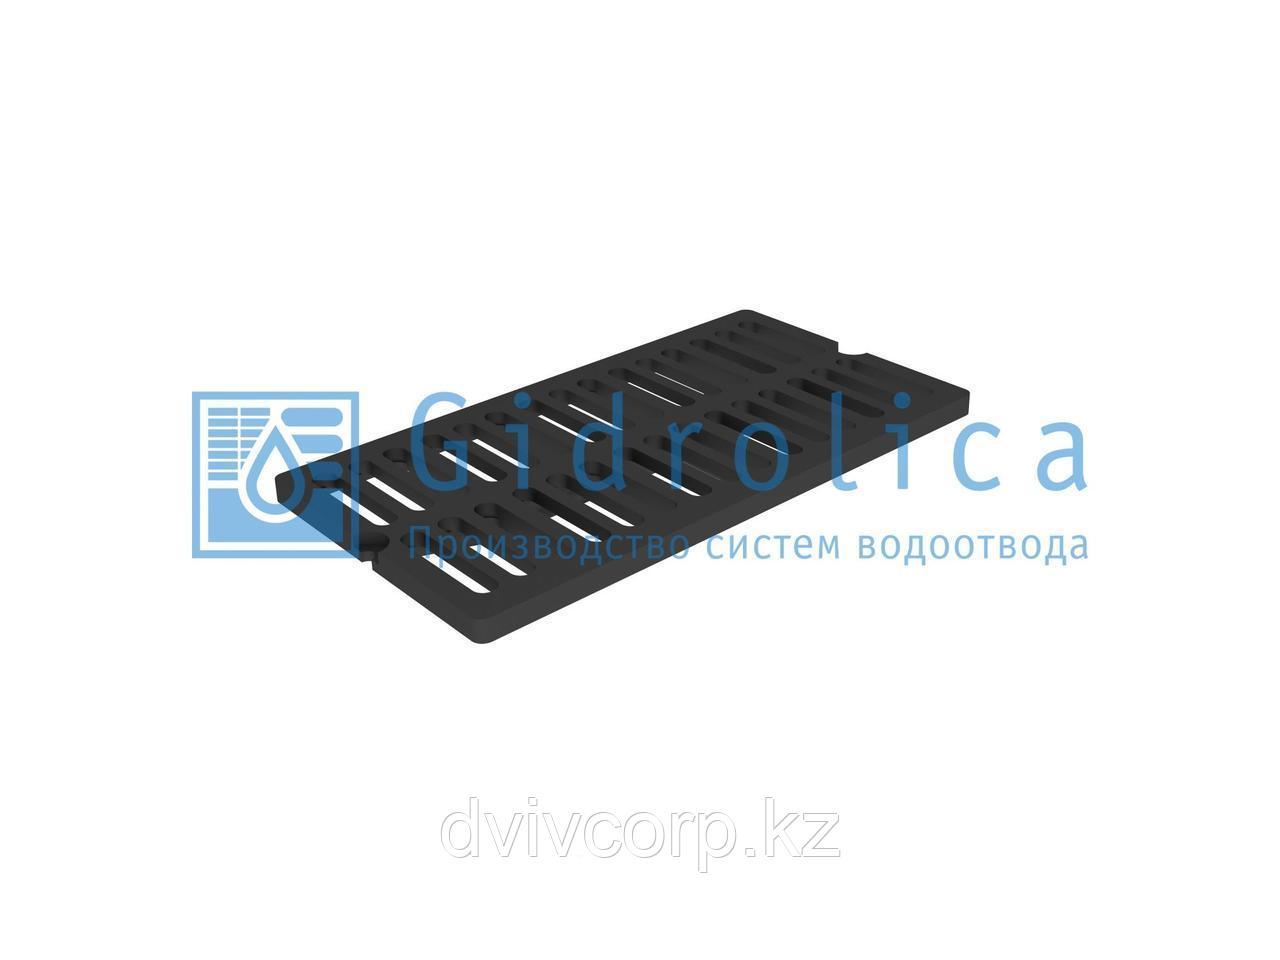 Арт. 5072D Решетка водоприемная СЧ 750*400*27 – чугунная, кл. D400